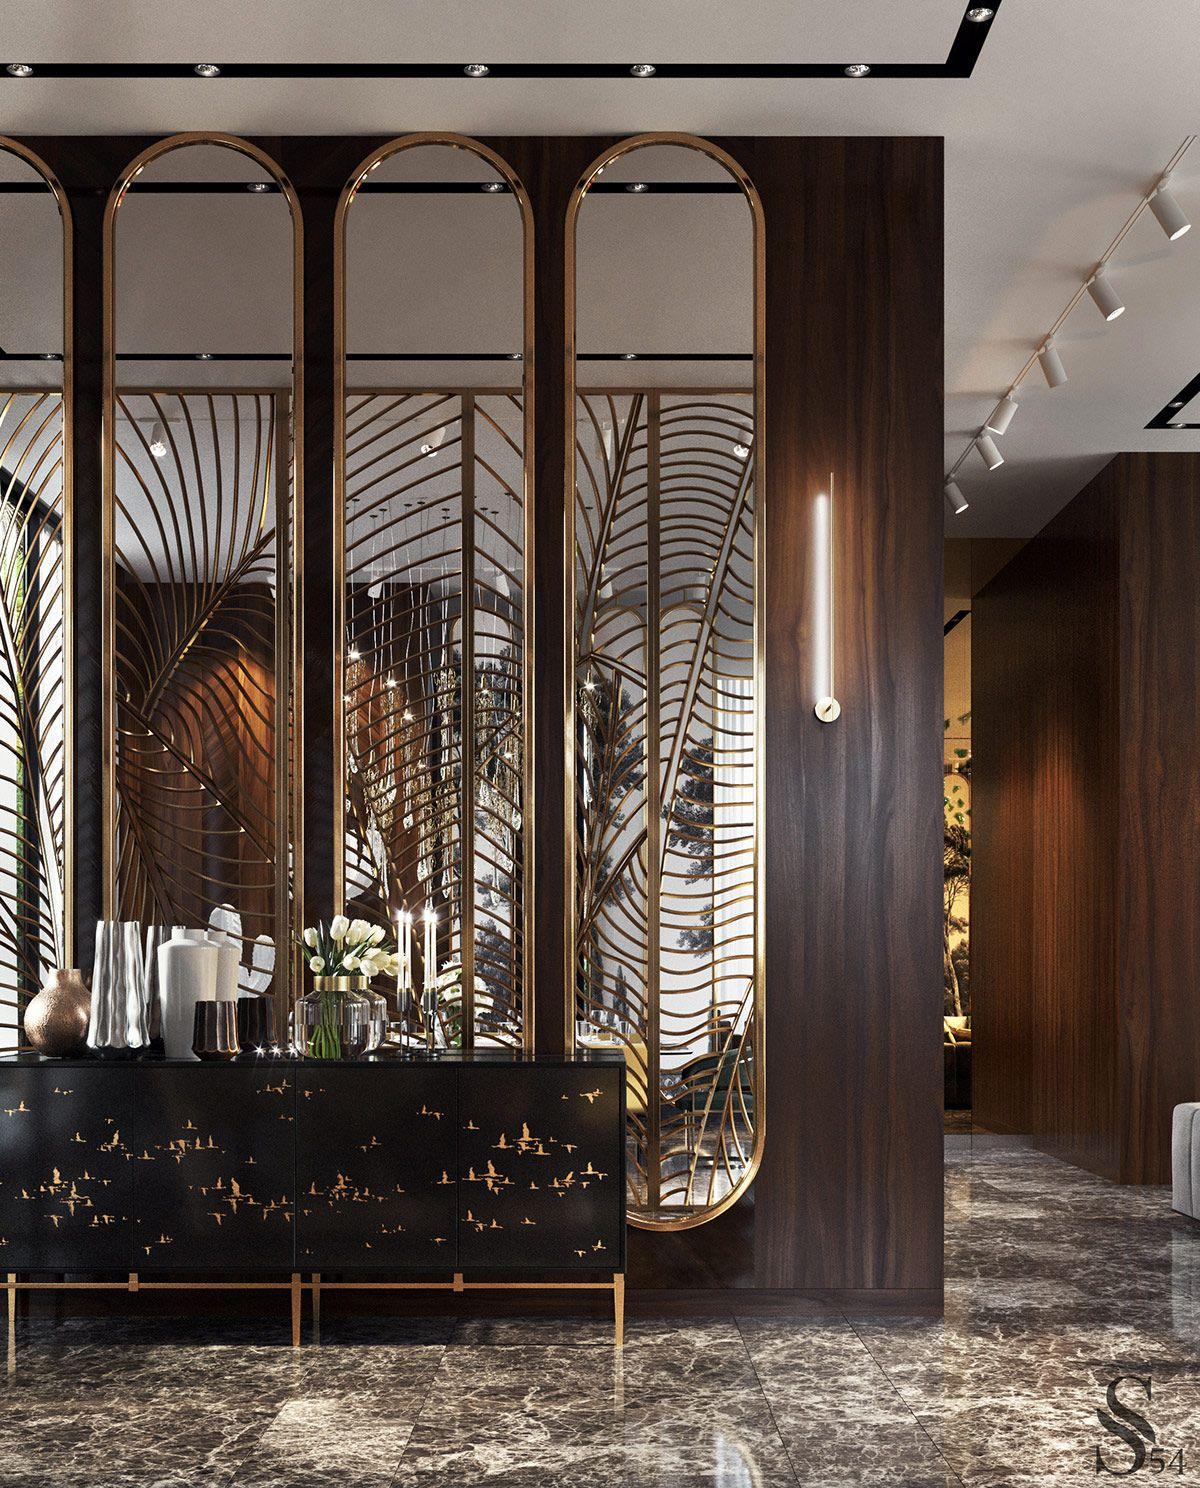 HOME DESIGNING: Luxury Modern Moroccan Interior Design - Contemporary Designers Furniture – Da Vinci Lifestyle